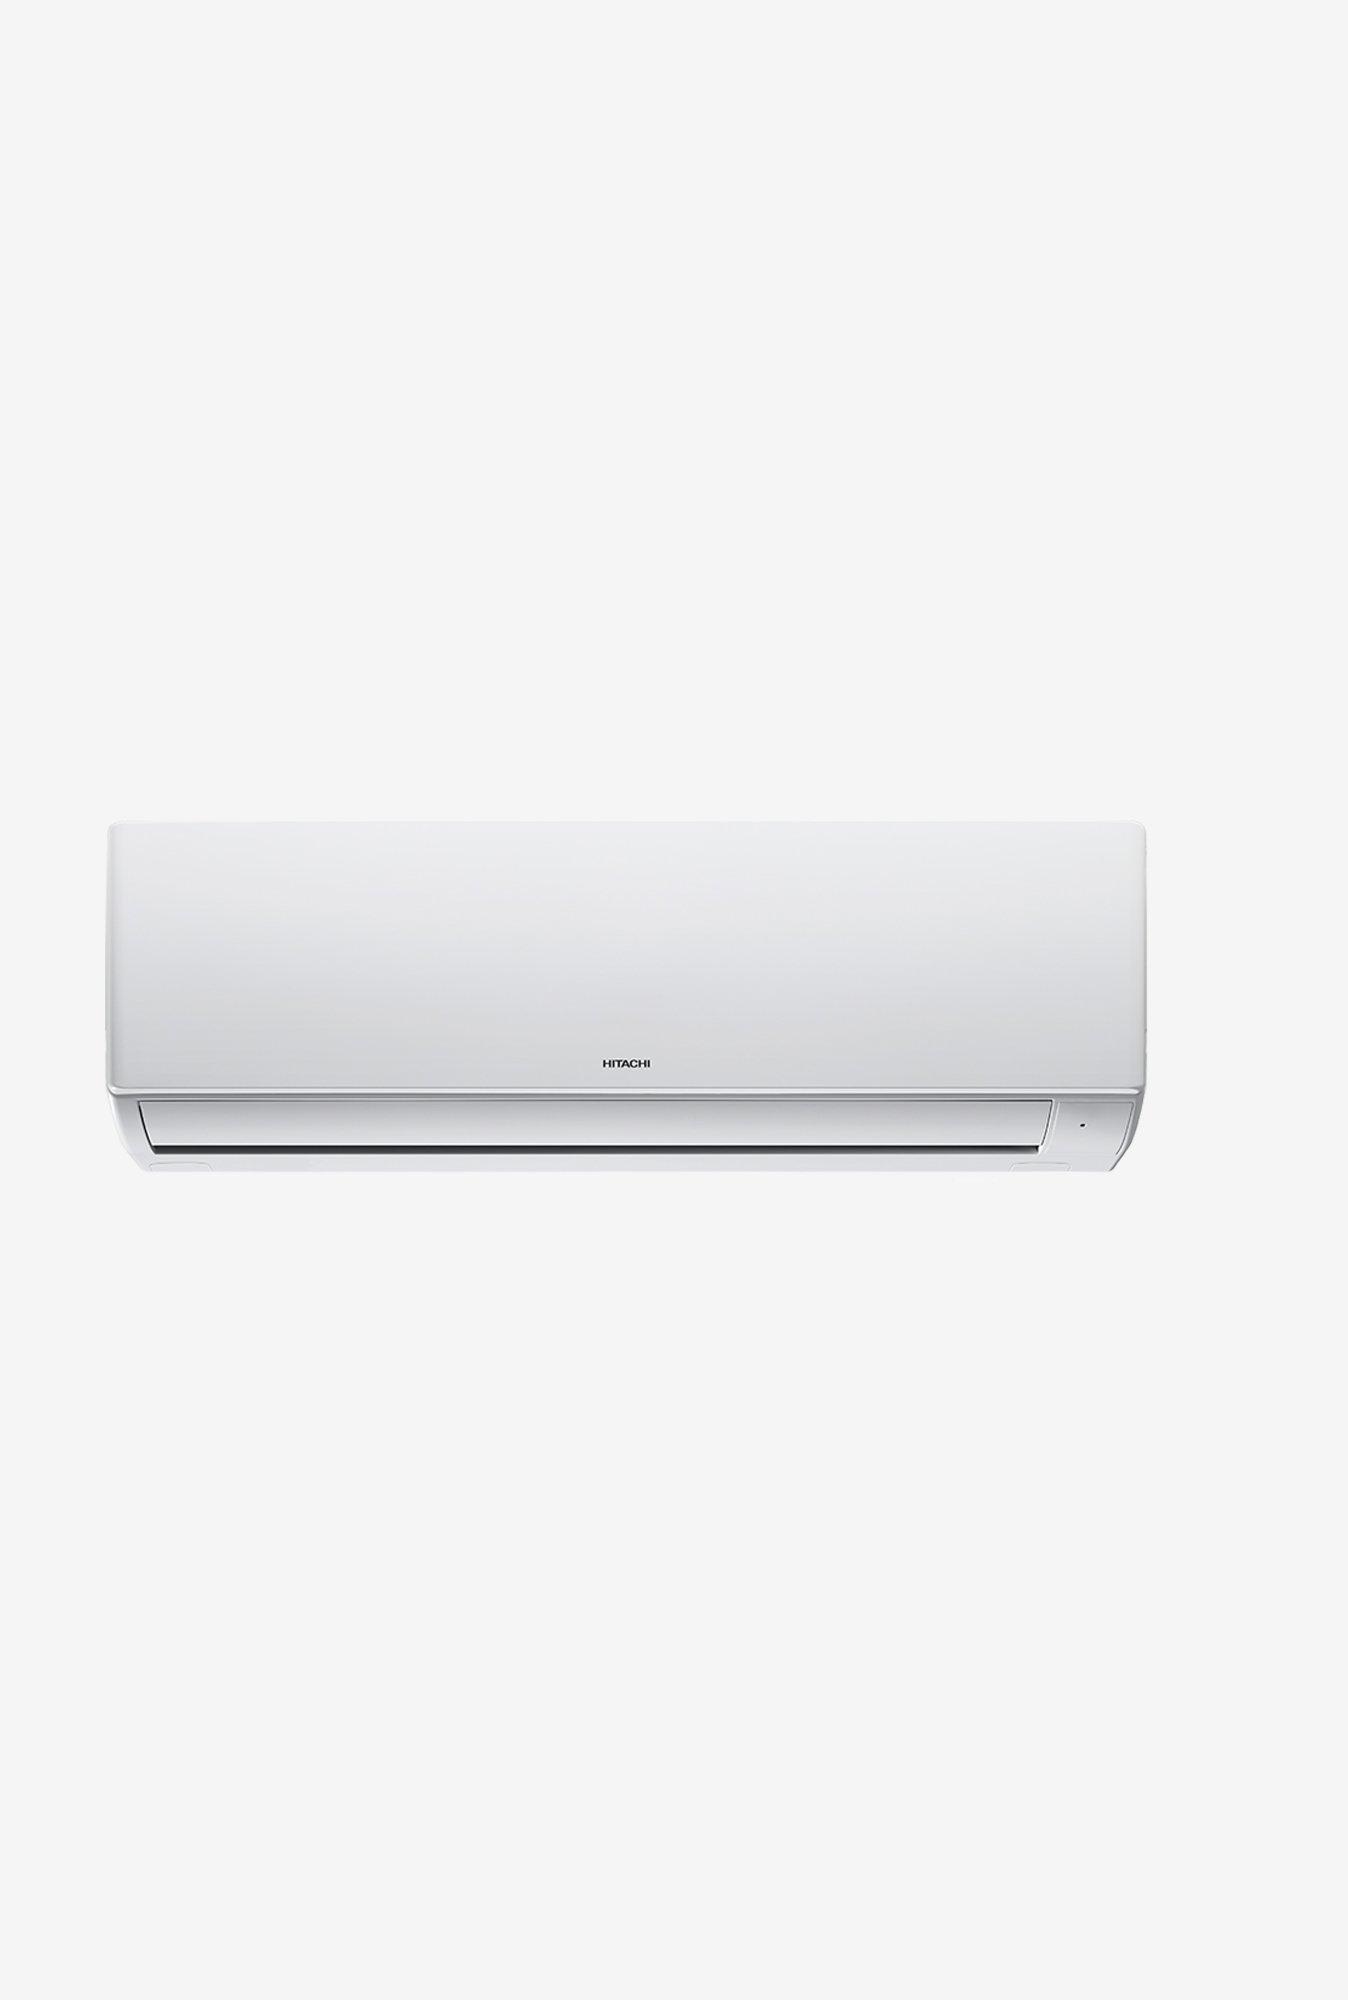 gree air conditioner service manual